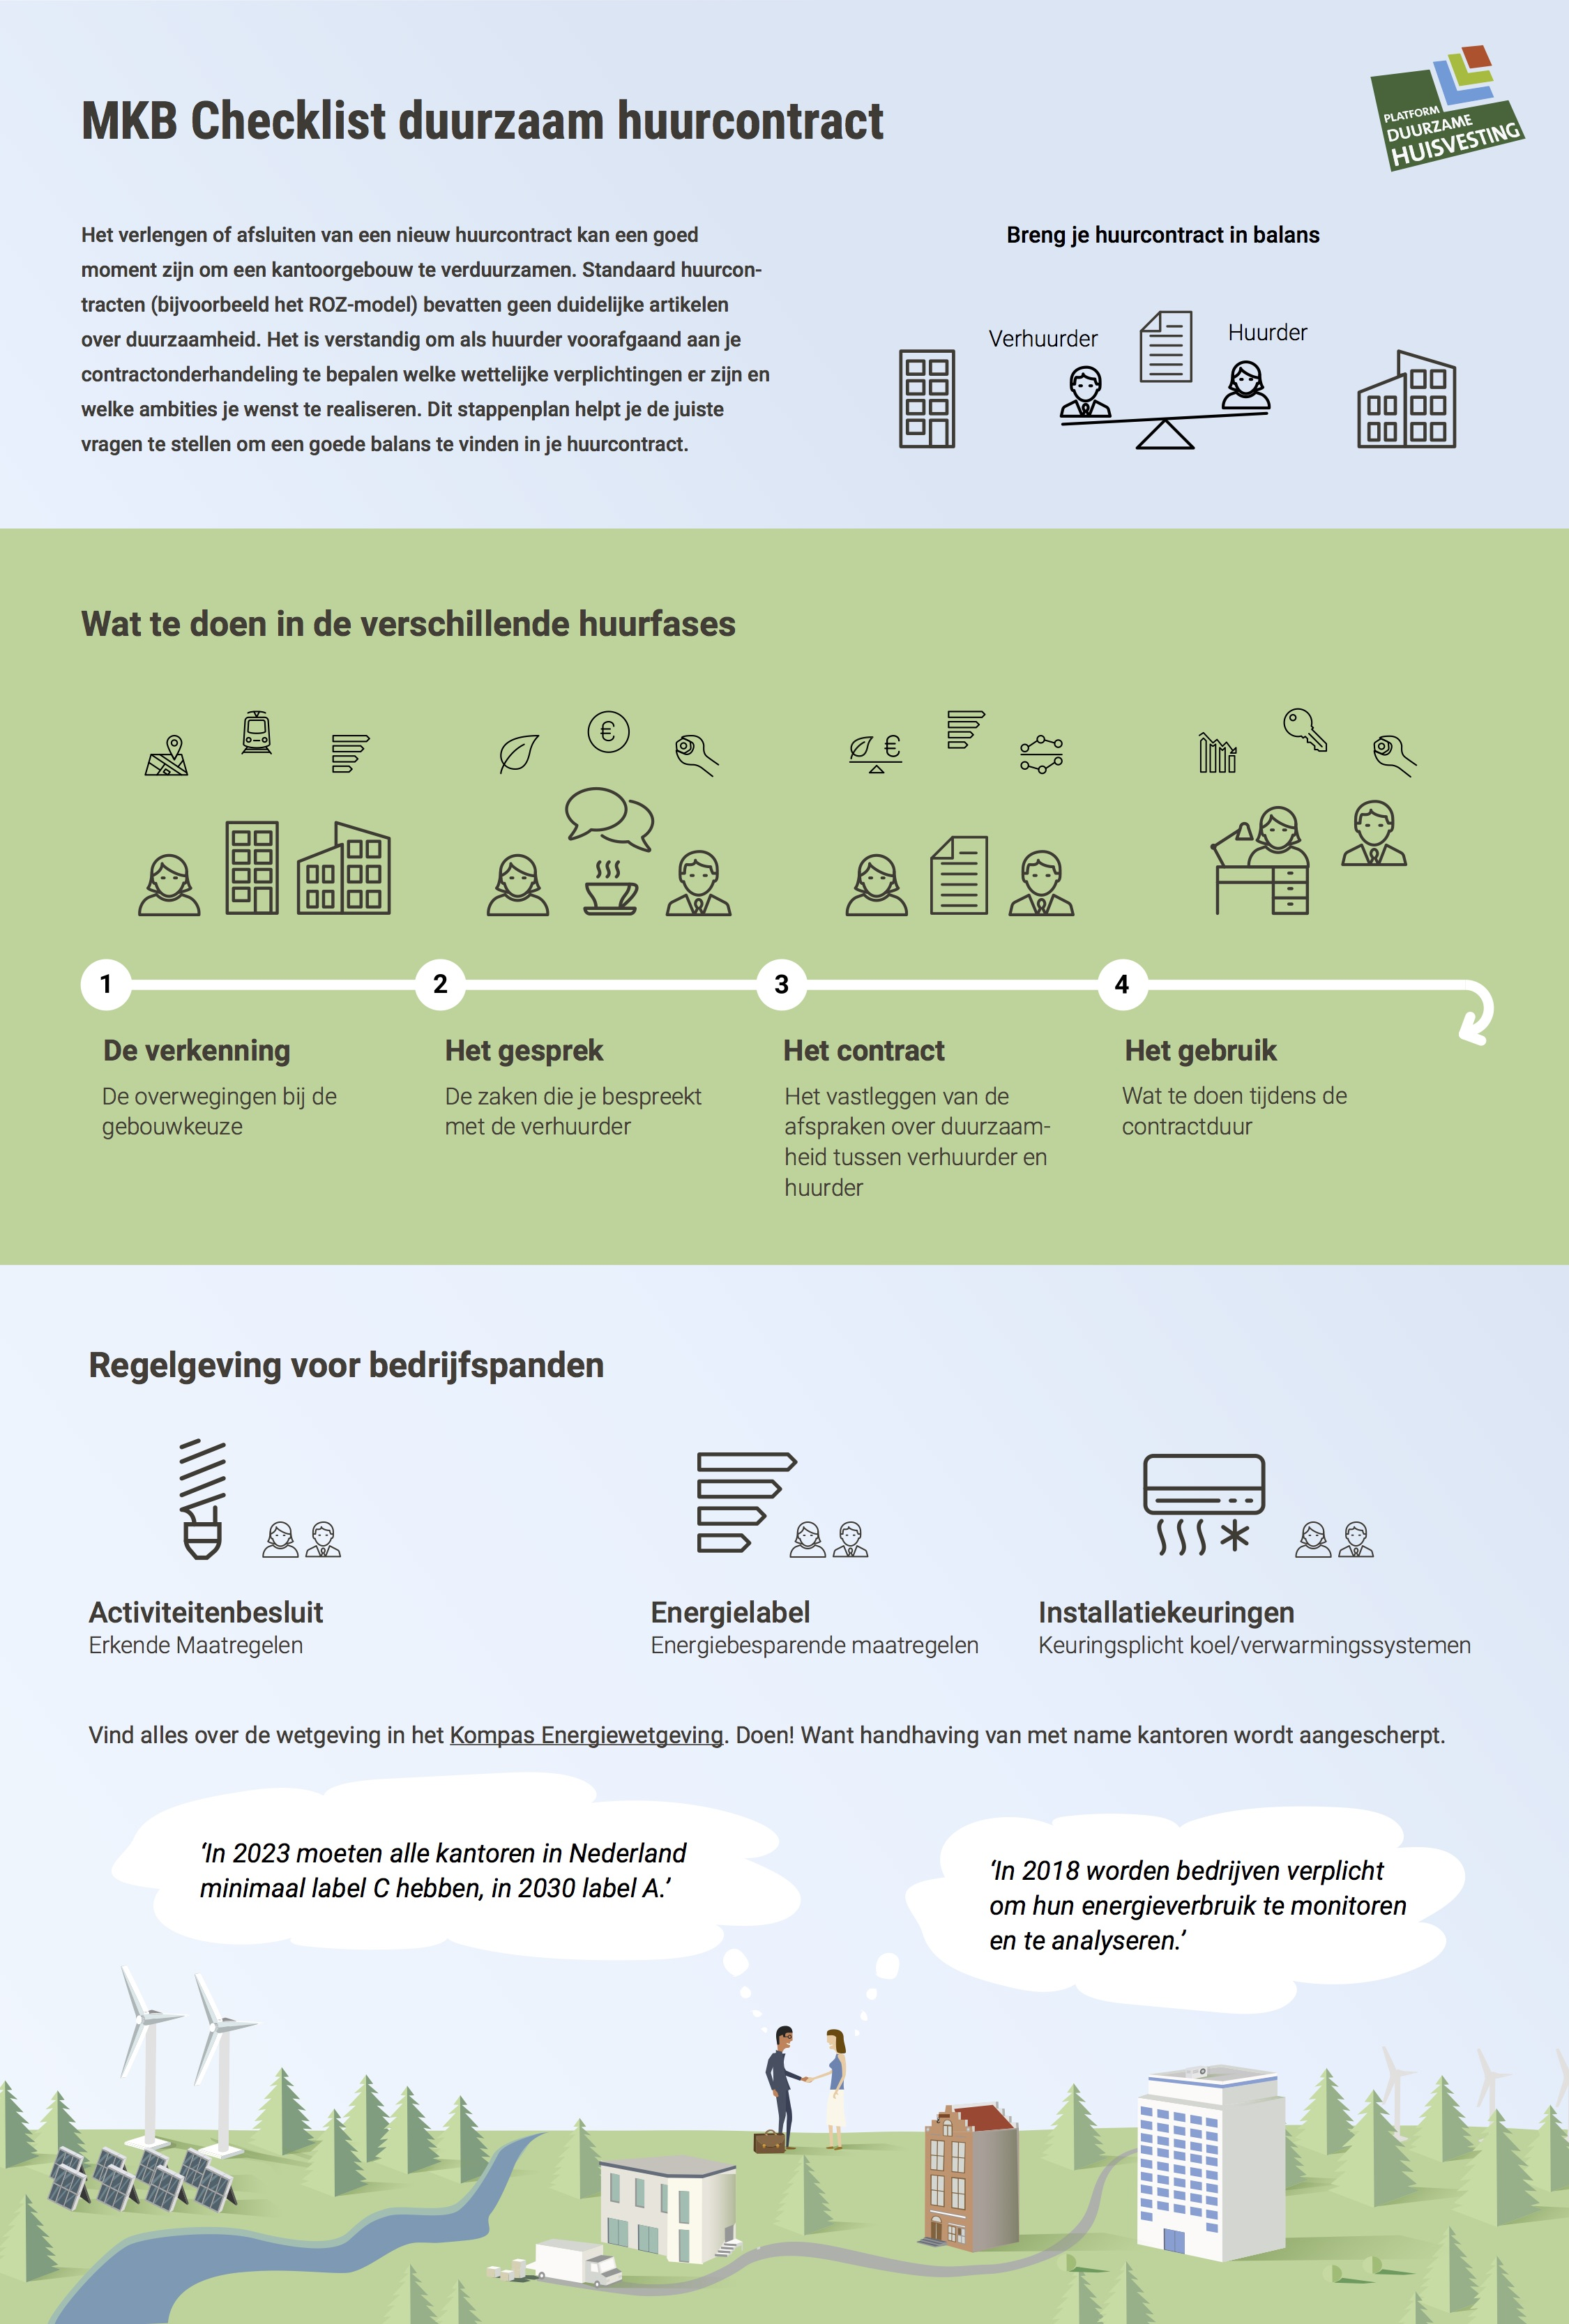 MKB checklist duurzaam huurcontract